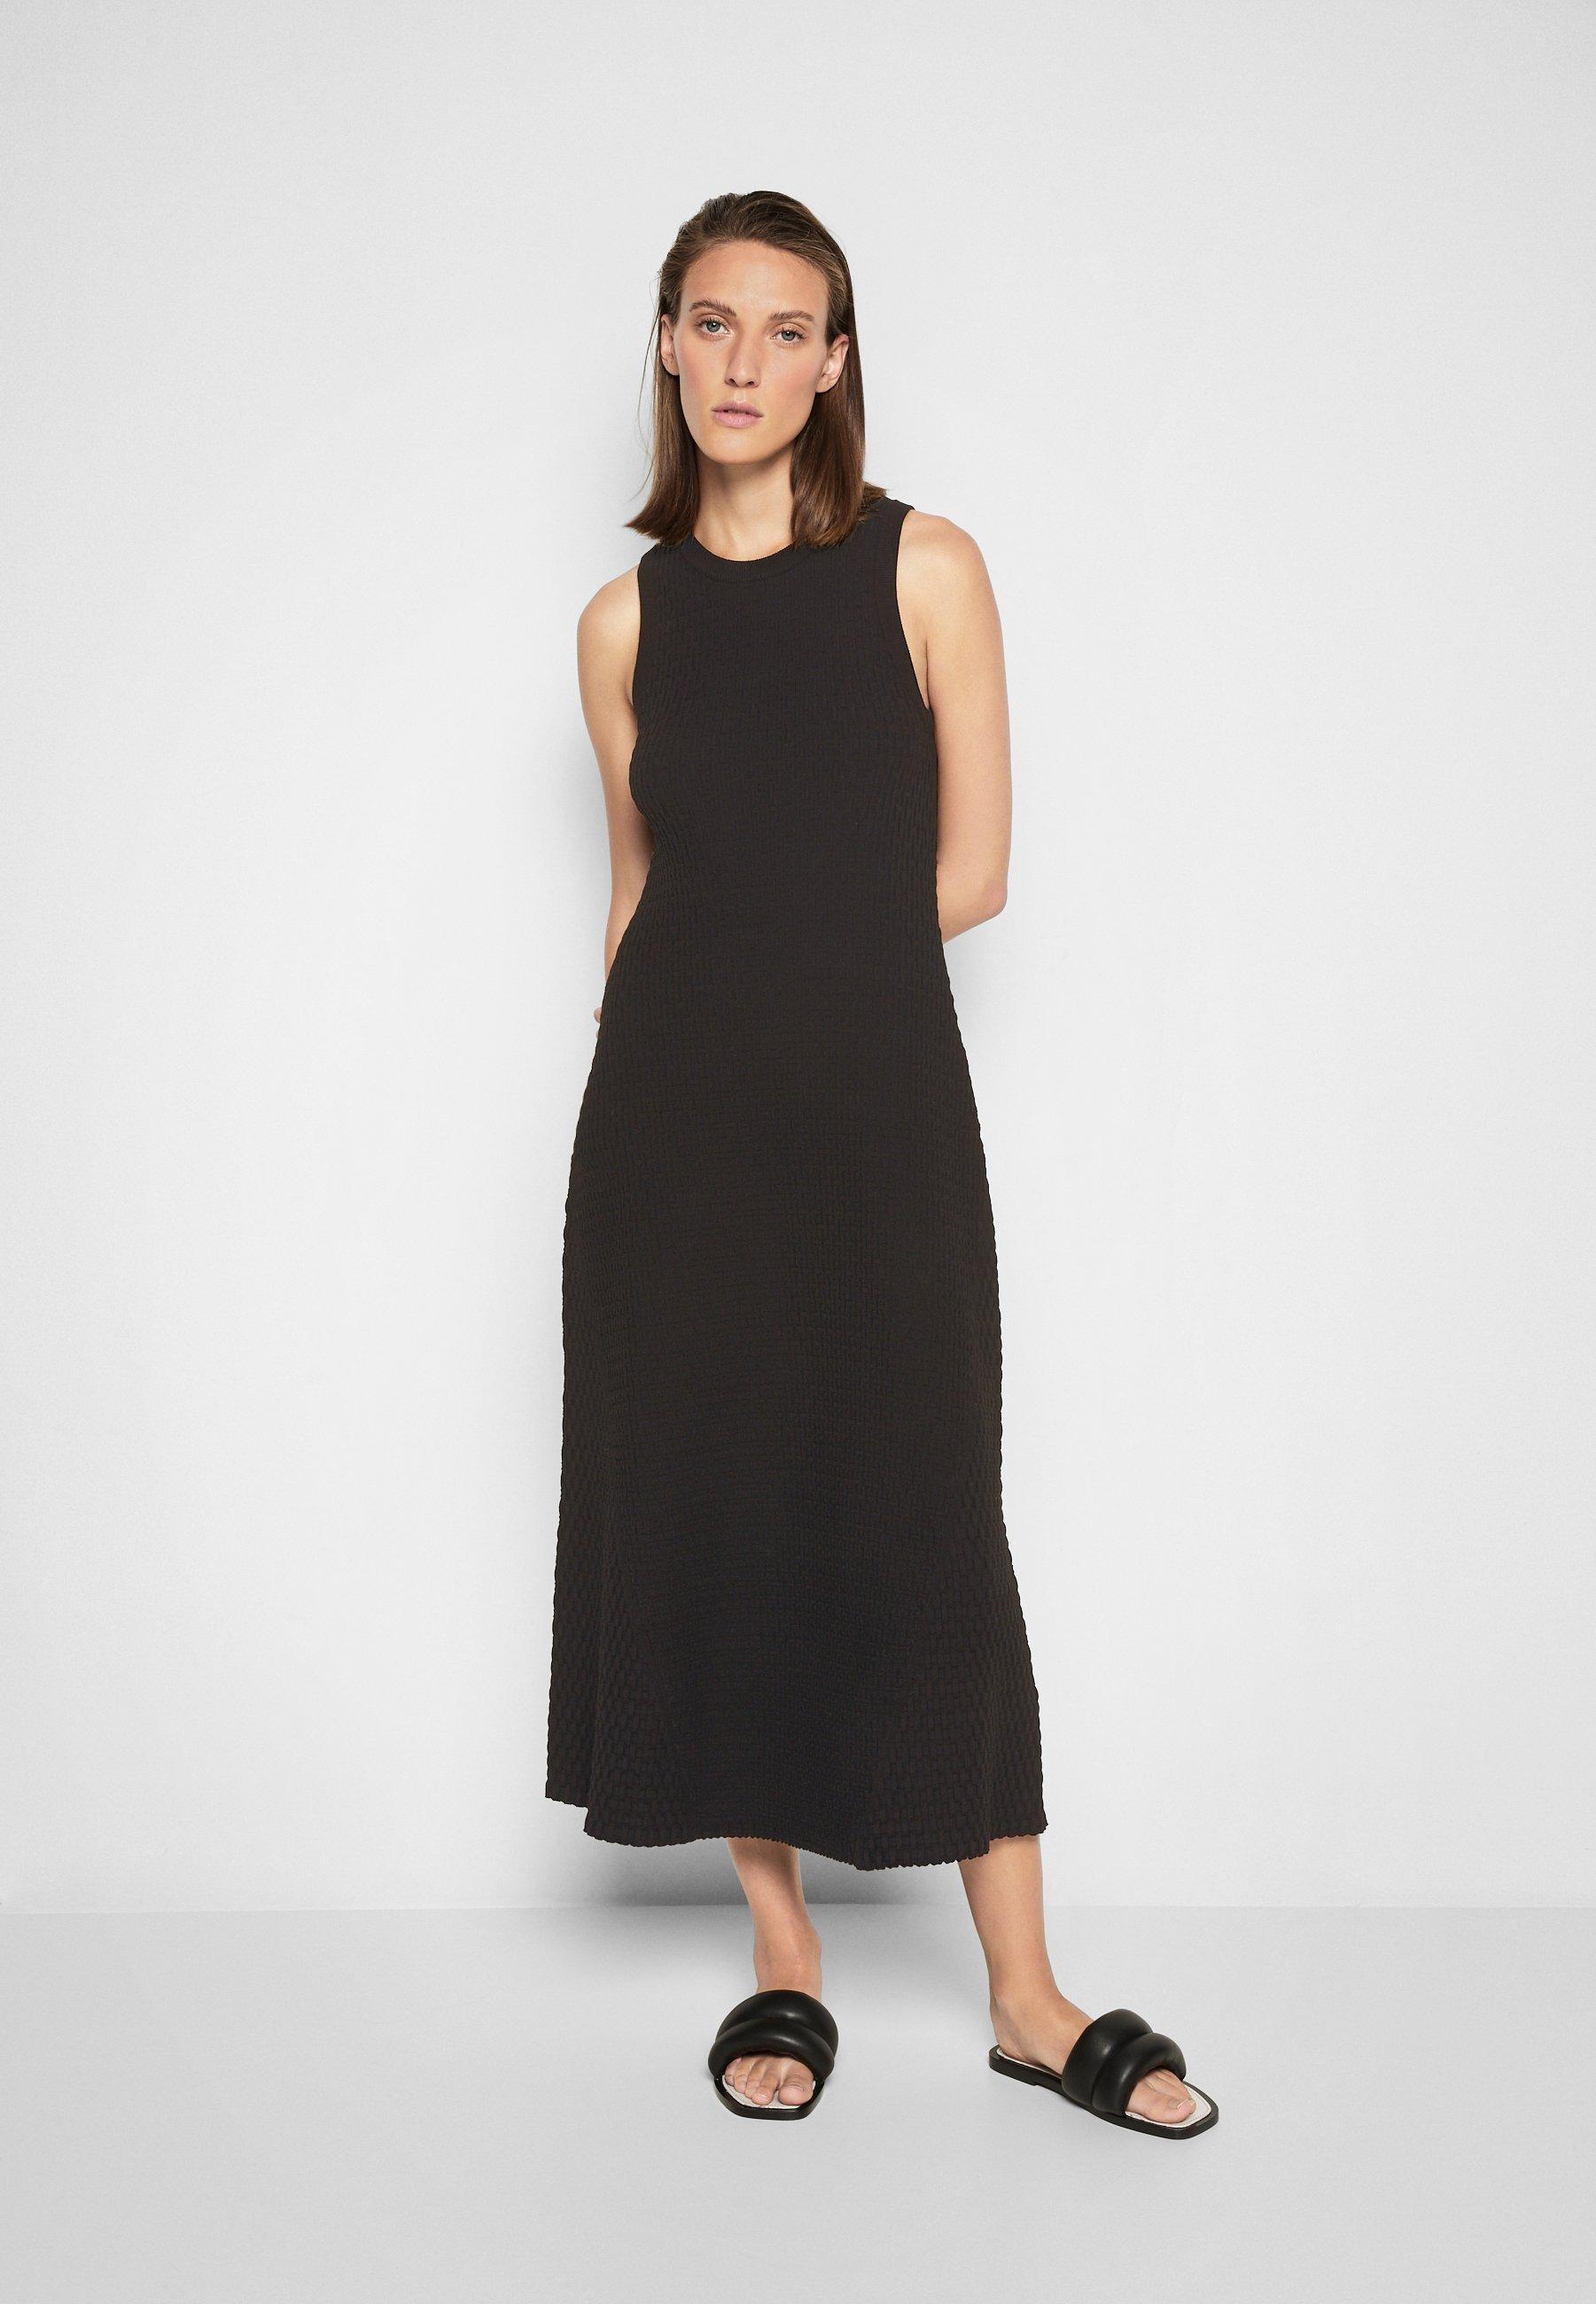 Women ALANIS - Jumper dress